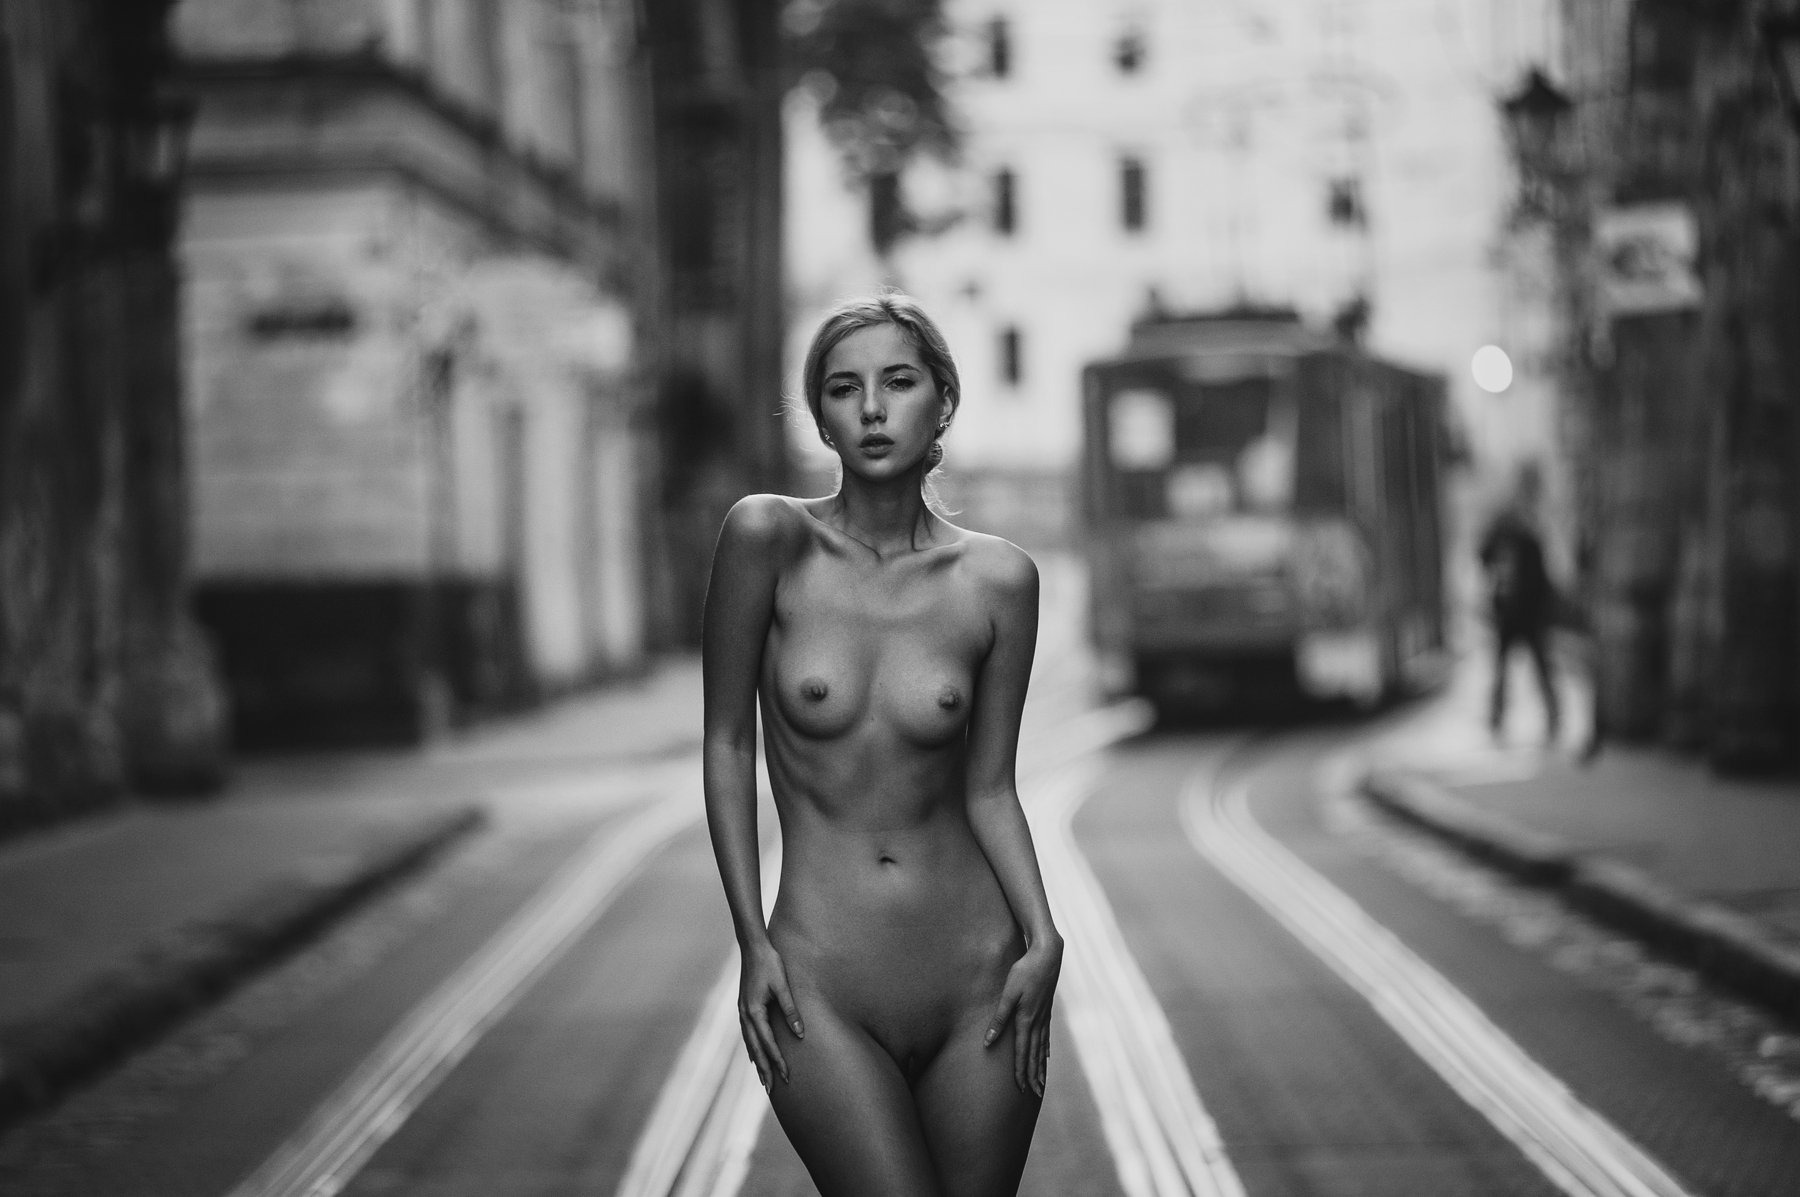 Yul brynner, photographic genius